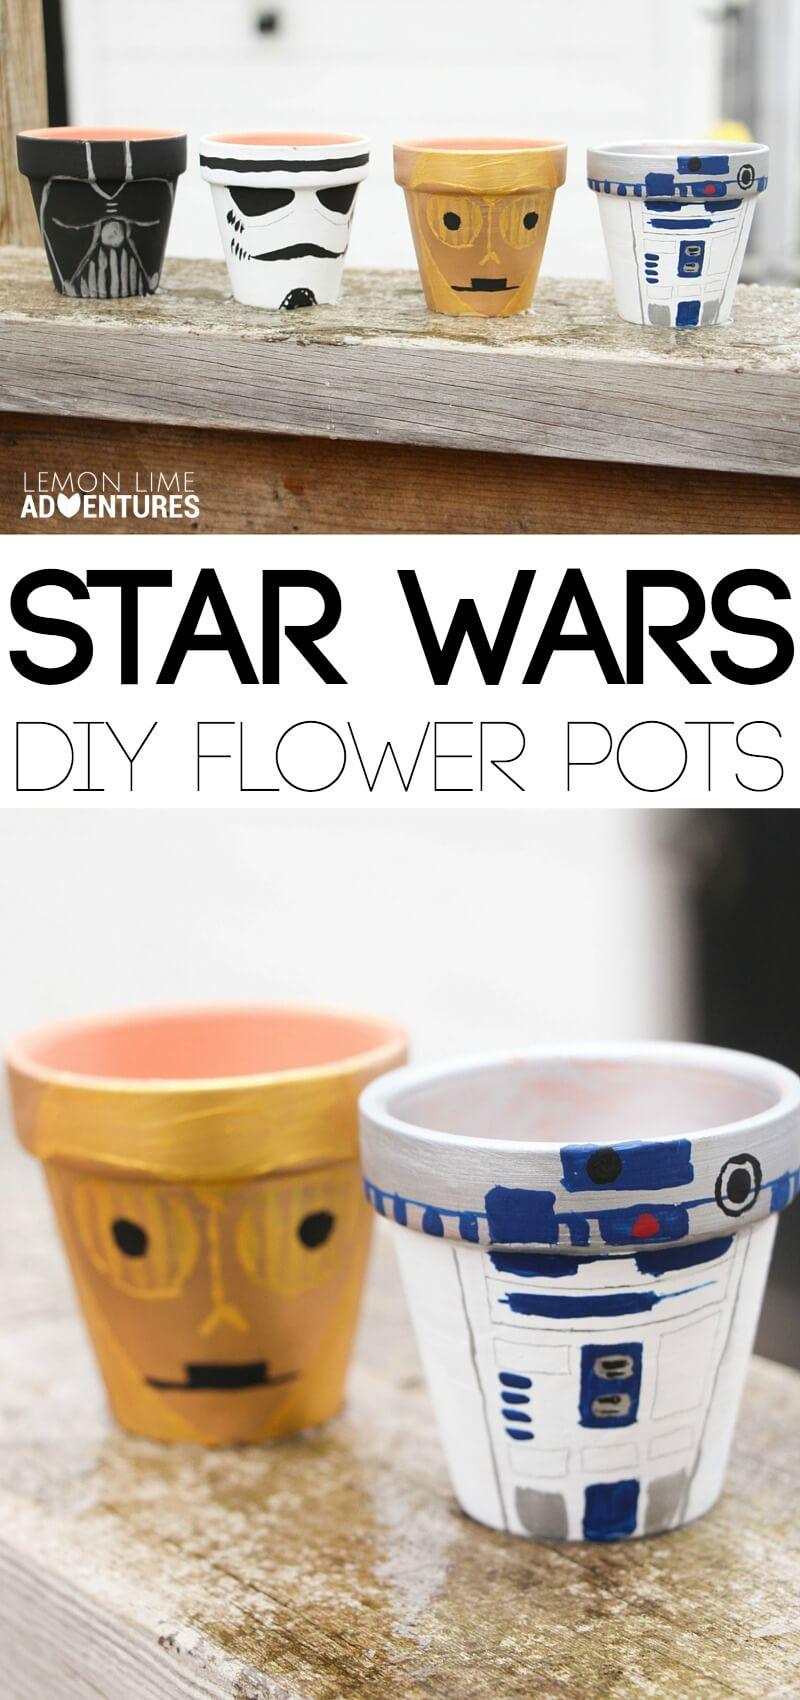 star wars garden pot tutorial (1)